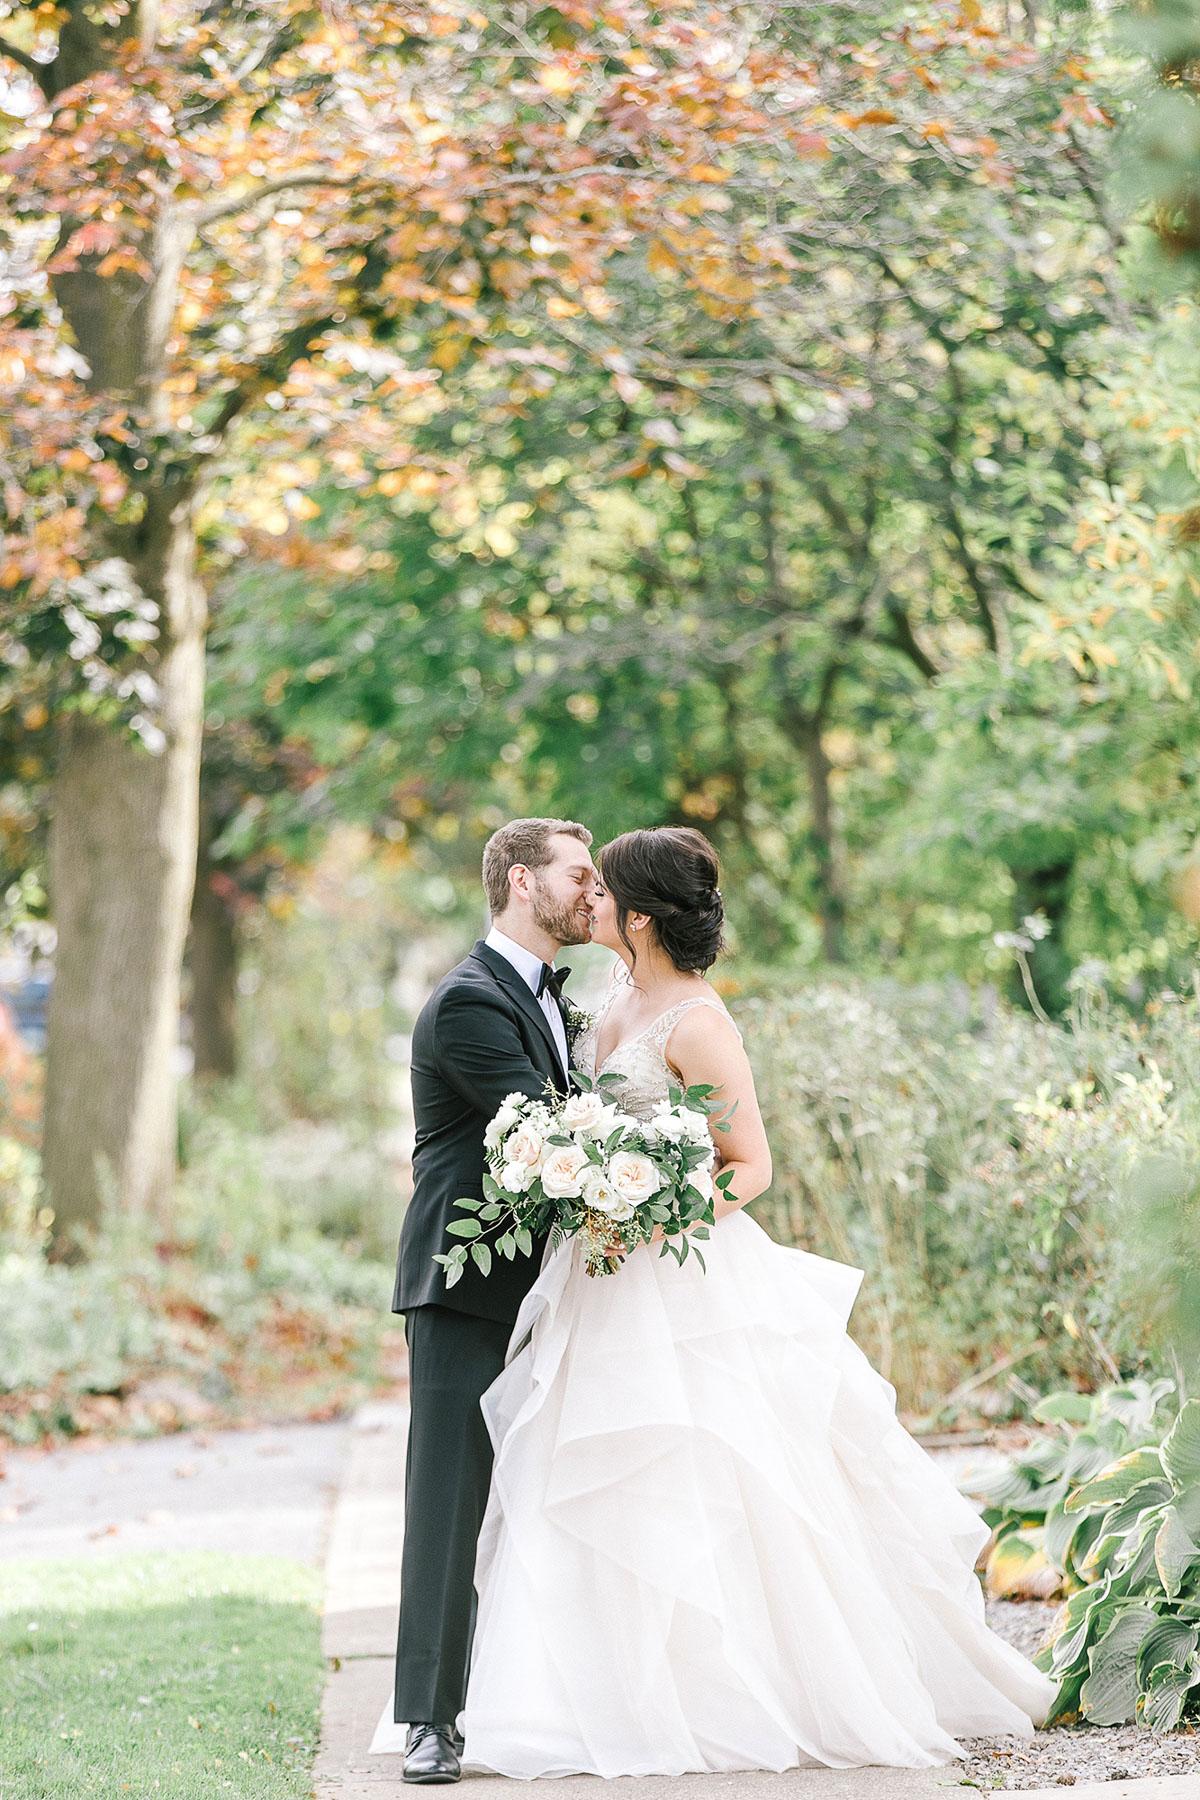 tamara-lockwood-photography-vineyard-bride-swish-list-the-old-courthouse-niagara-on-the-lake-wedding-21.jpg